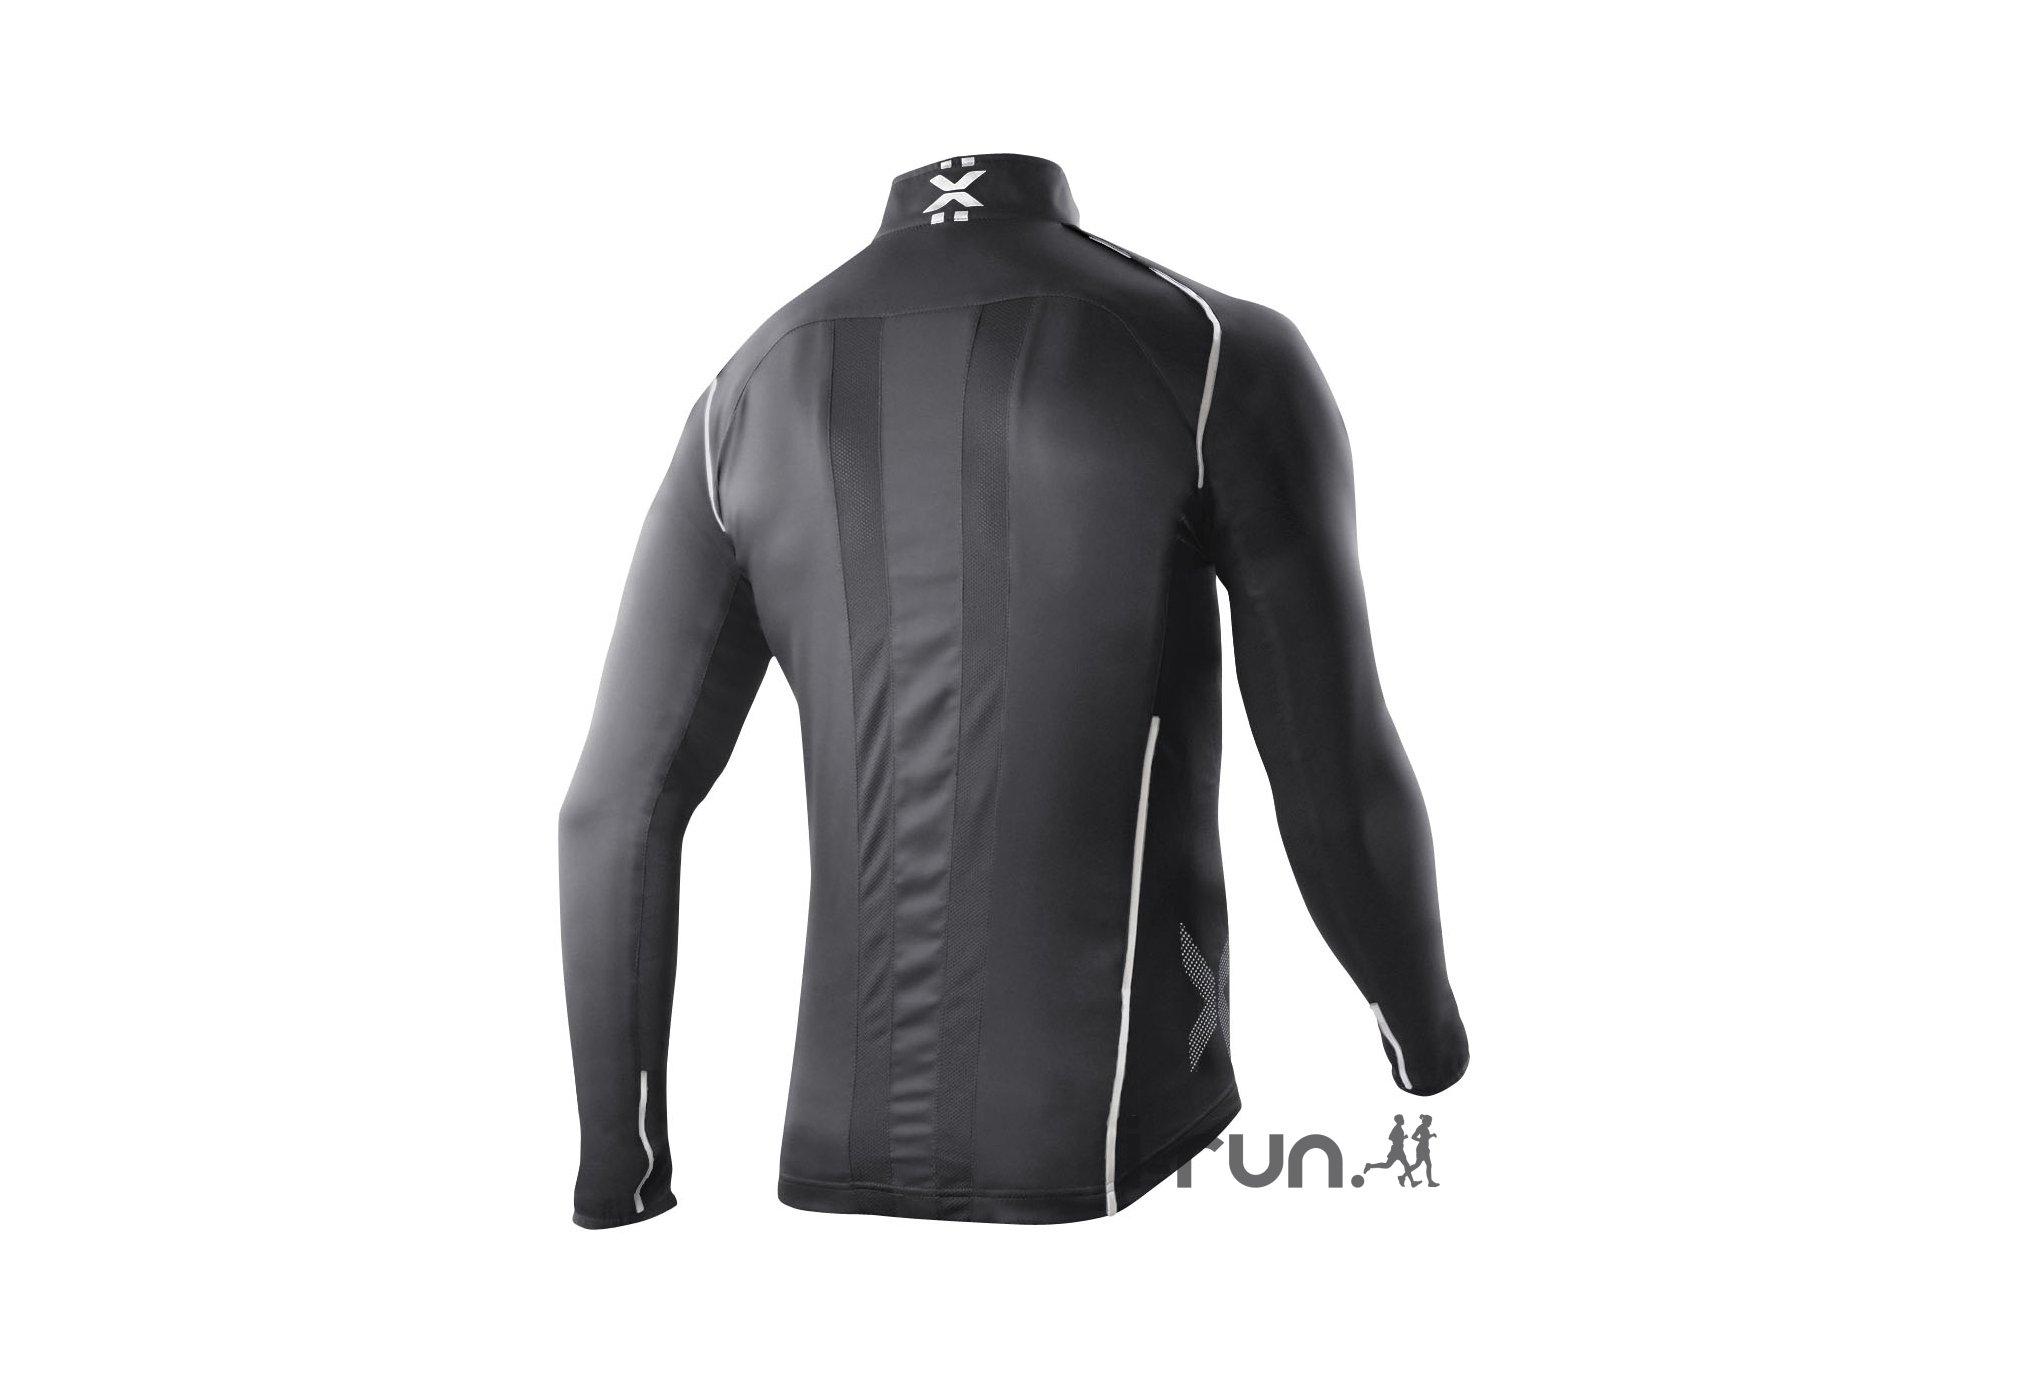 2xu veste 360 action m pas cher destockage 2xu running veste 360 action m e - Avis destockage fitness ...